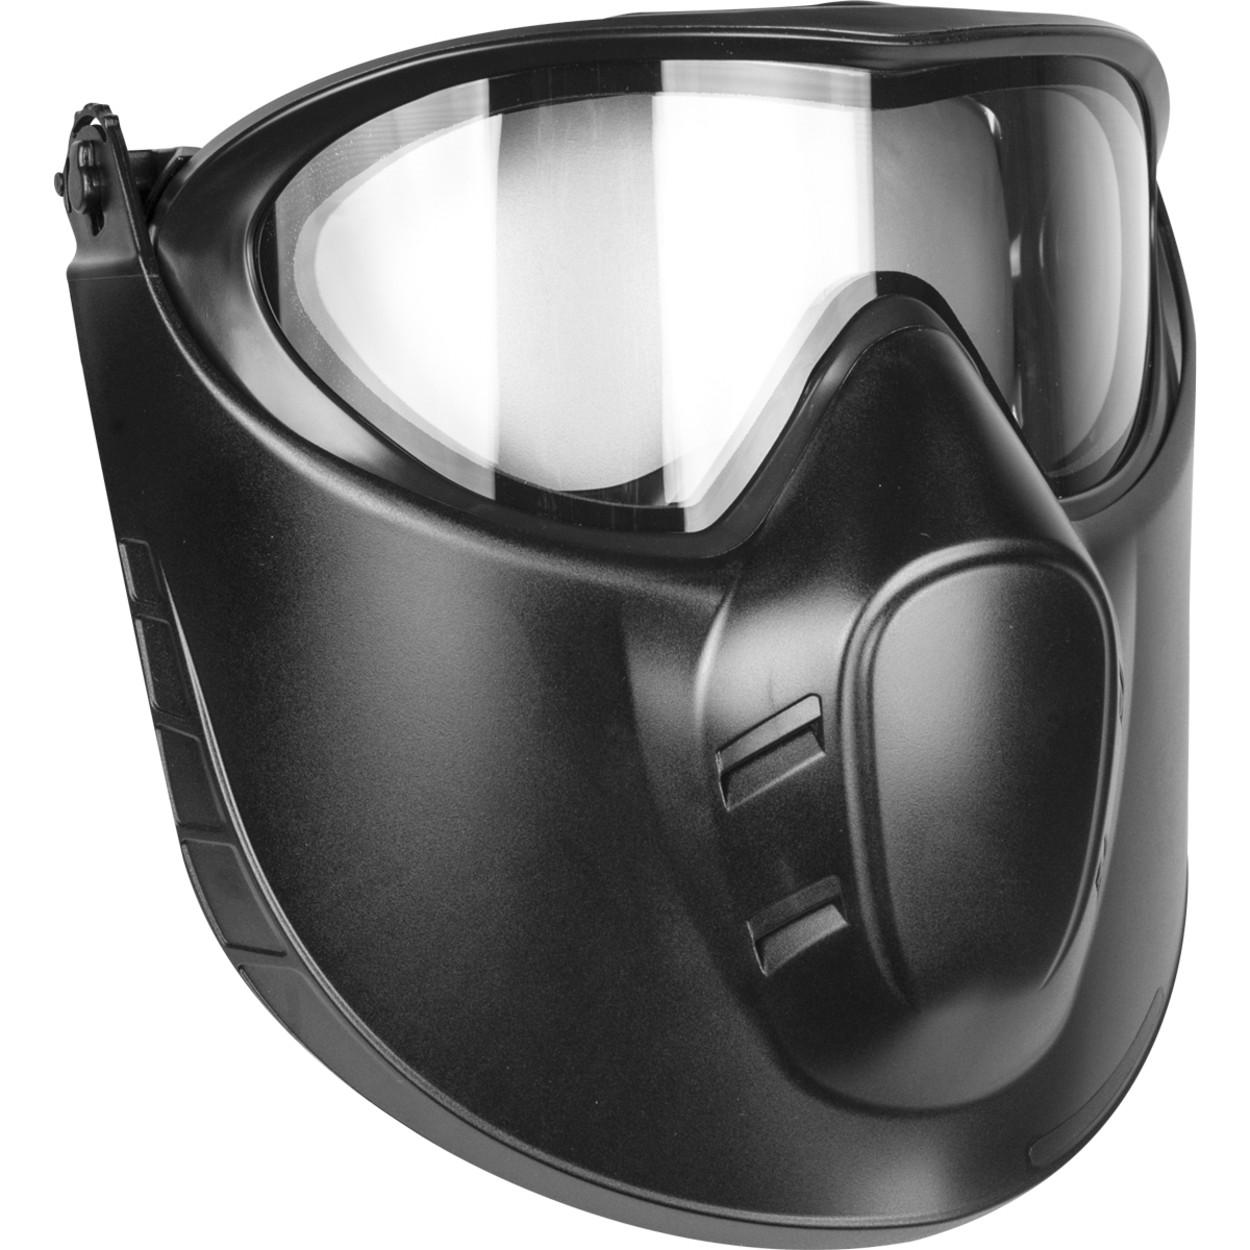 Valken VSM Thermal Goggles w/ Face Shield – Black product image